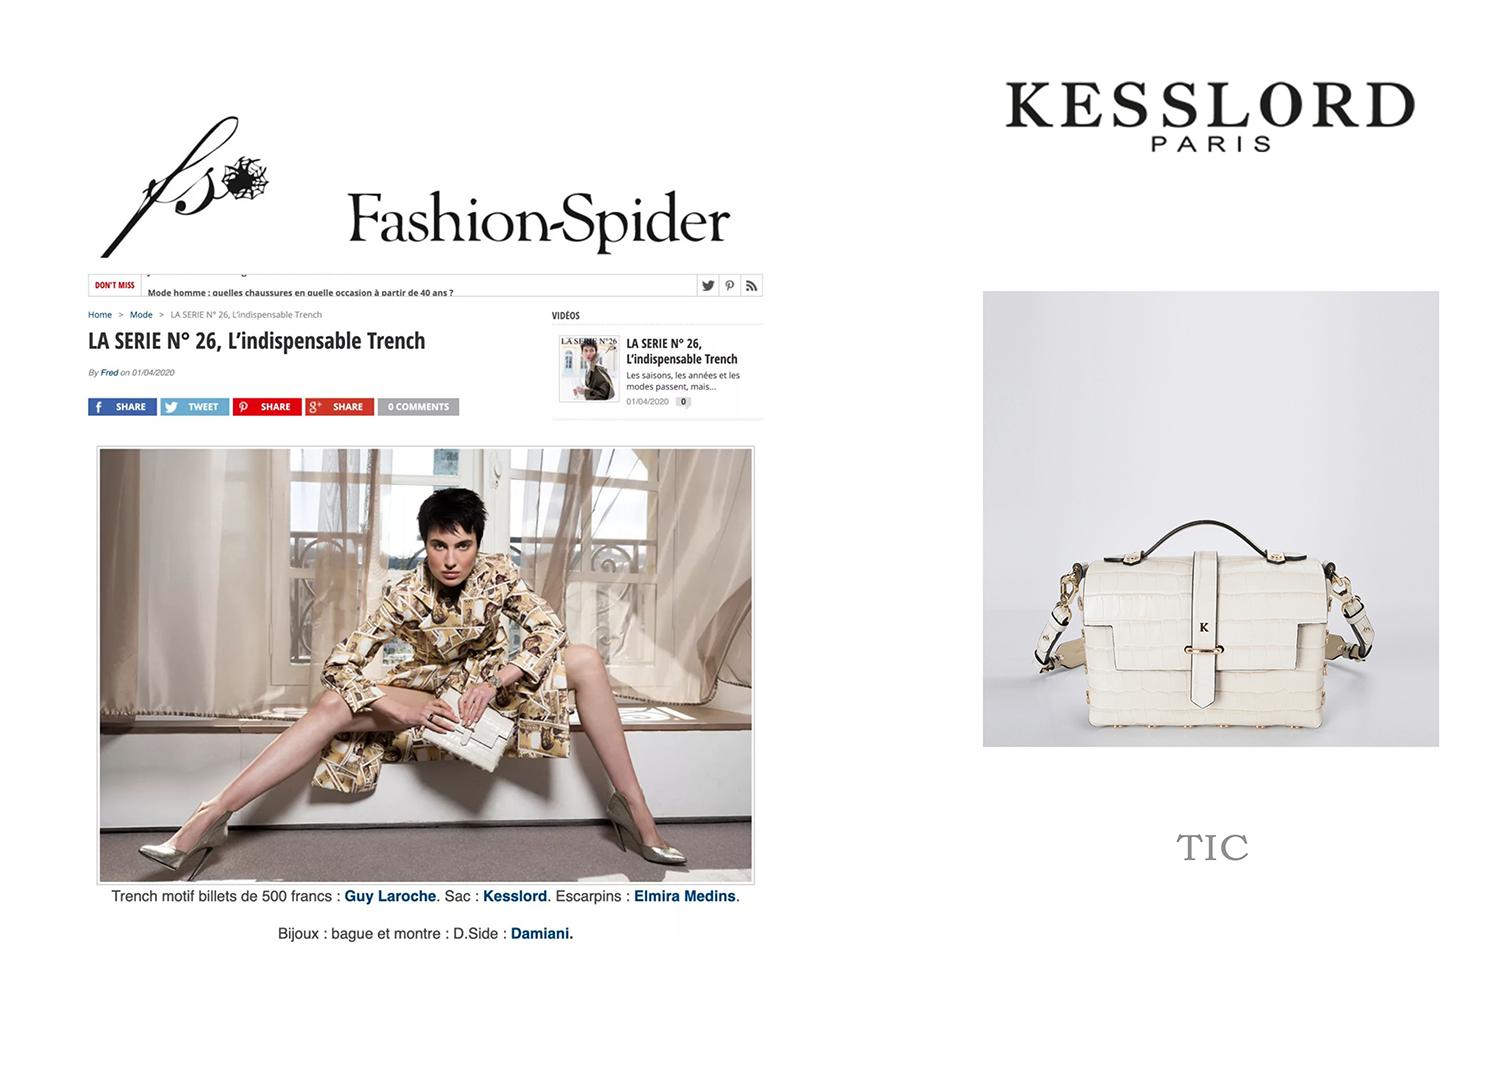 LA SERIE N° 26, L'indispensable Trench - Fashion Spider (fashion-spider.com)